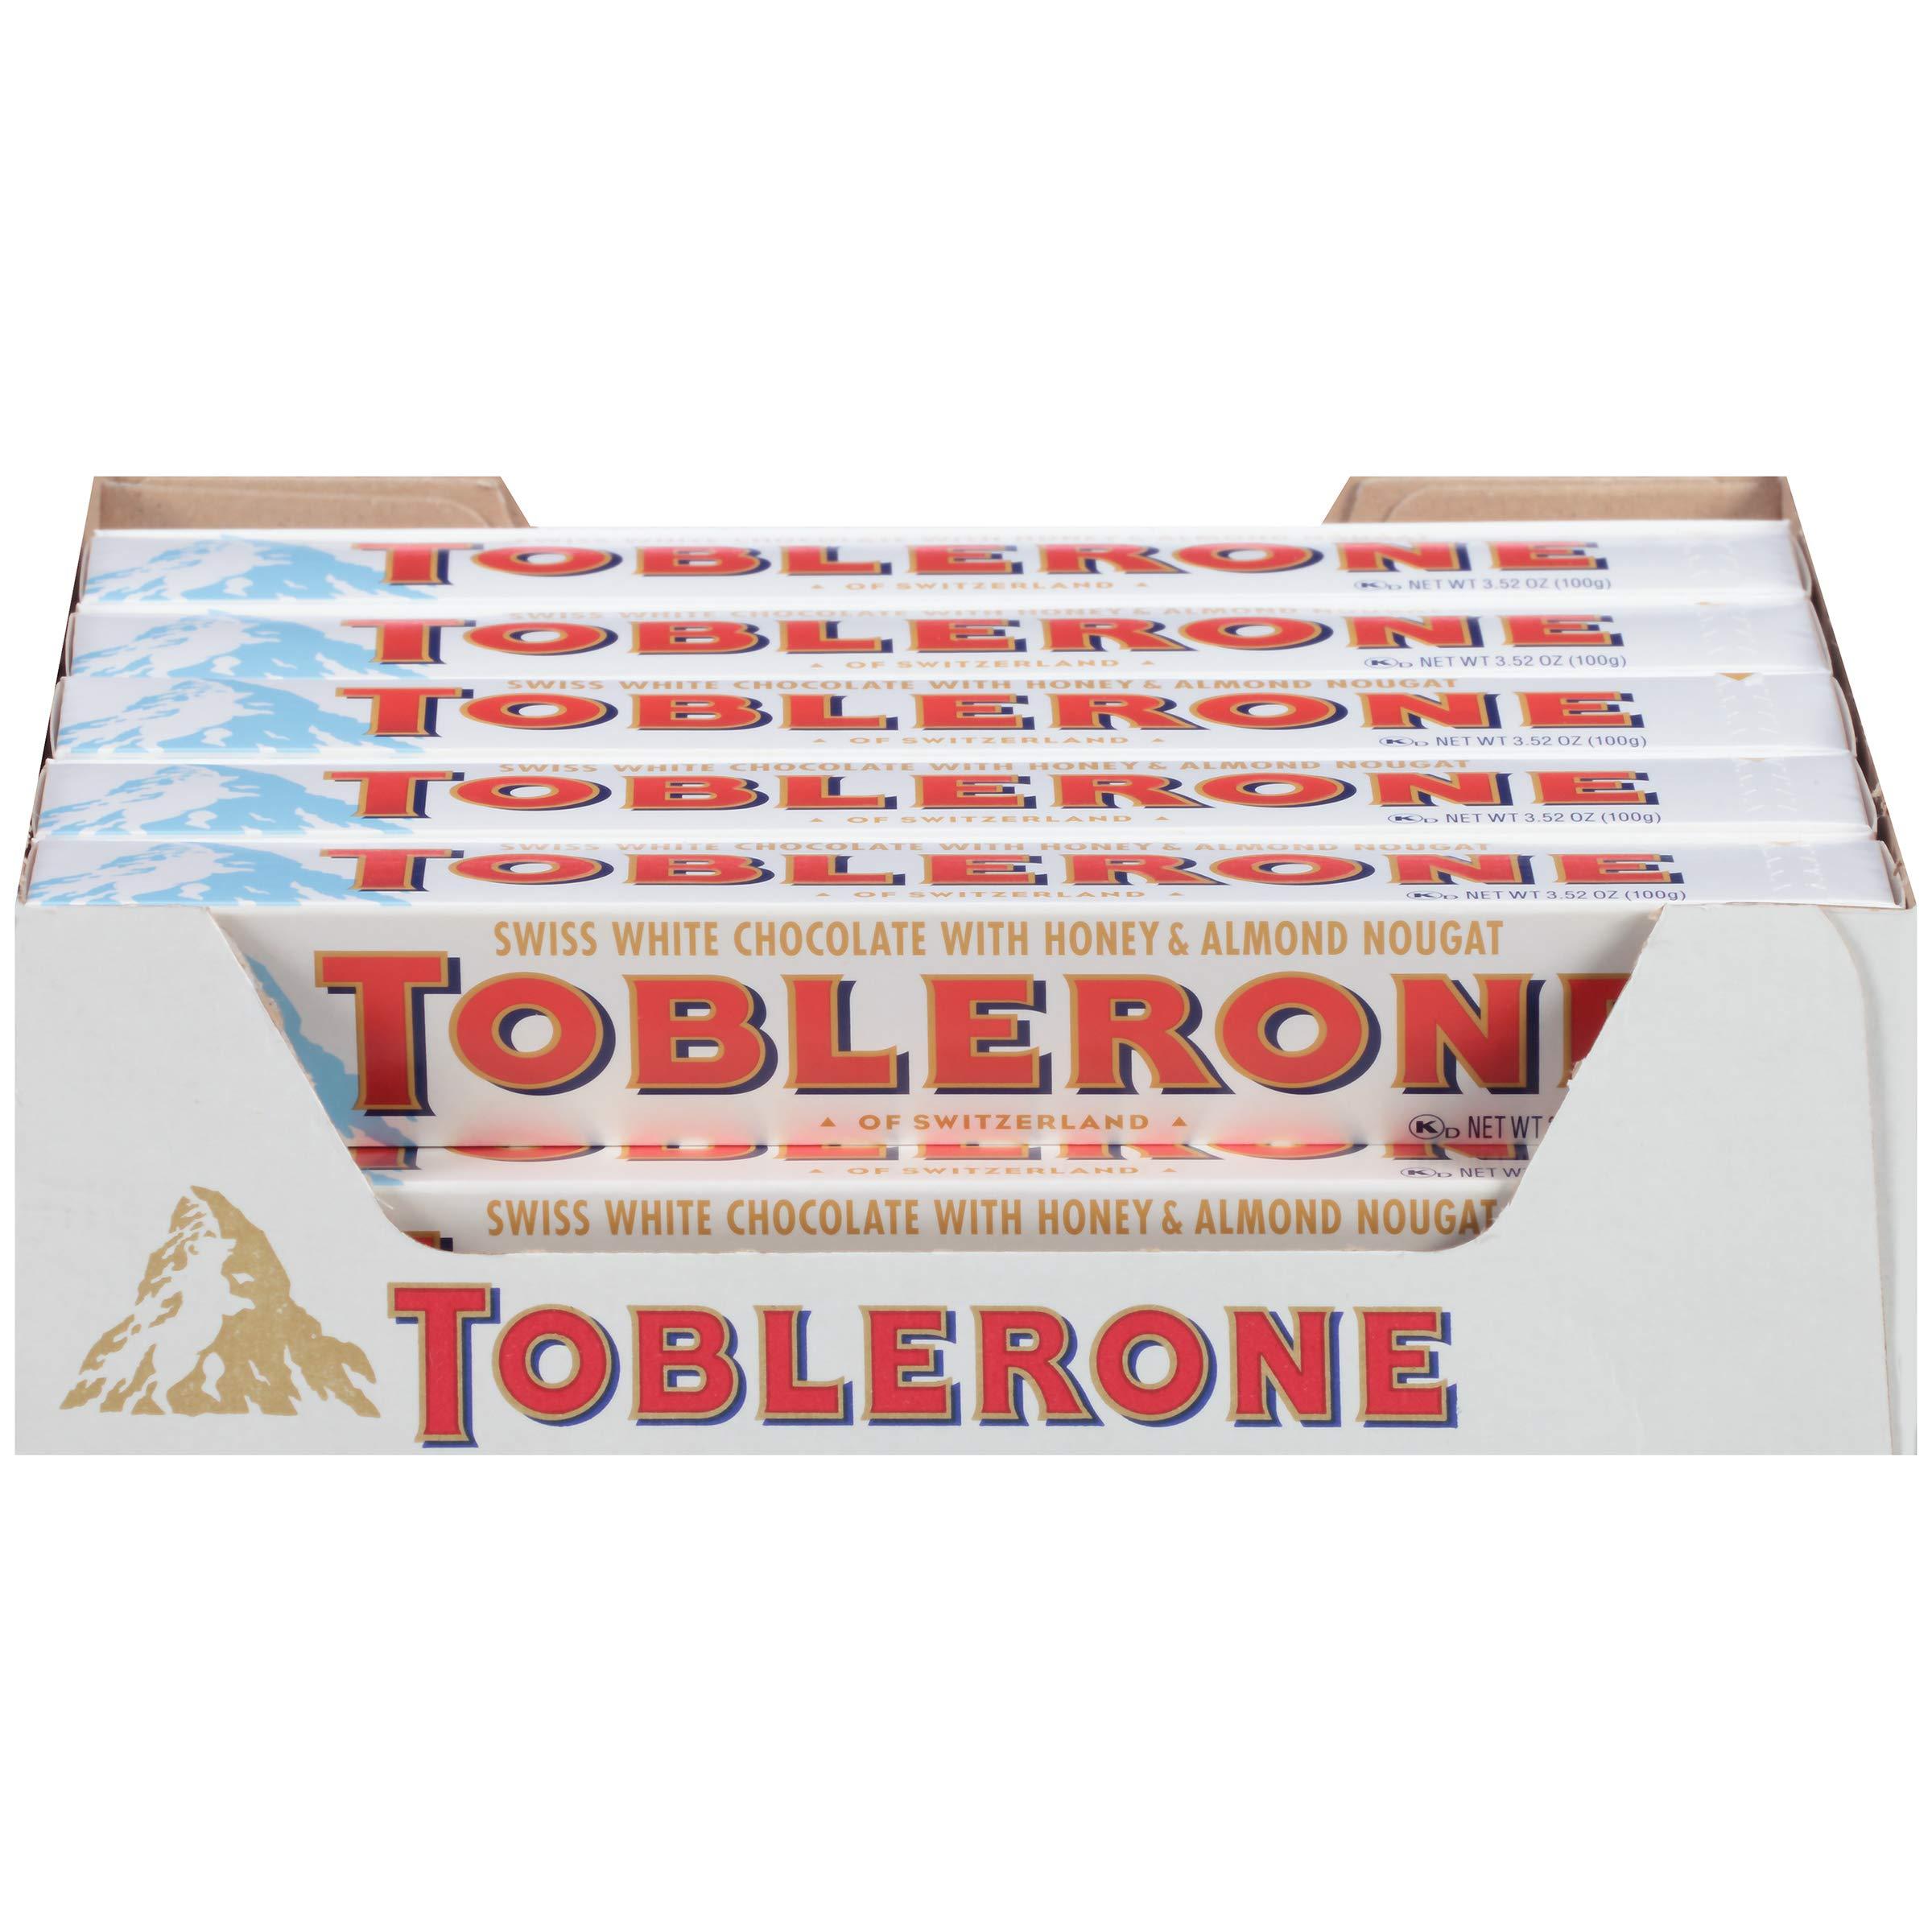 Toblerone Swiss White Chocolate Bars with Honey & Almond Nougat, Easter Chocolate, 20 - 3.52 oz Bars